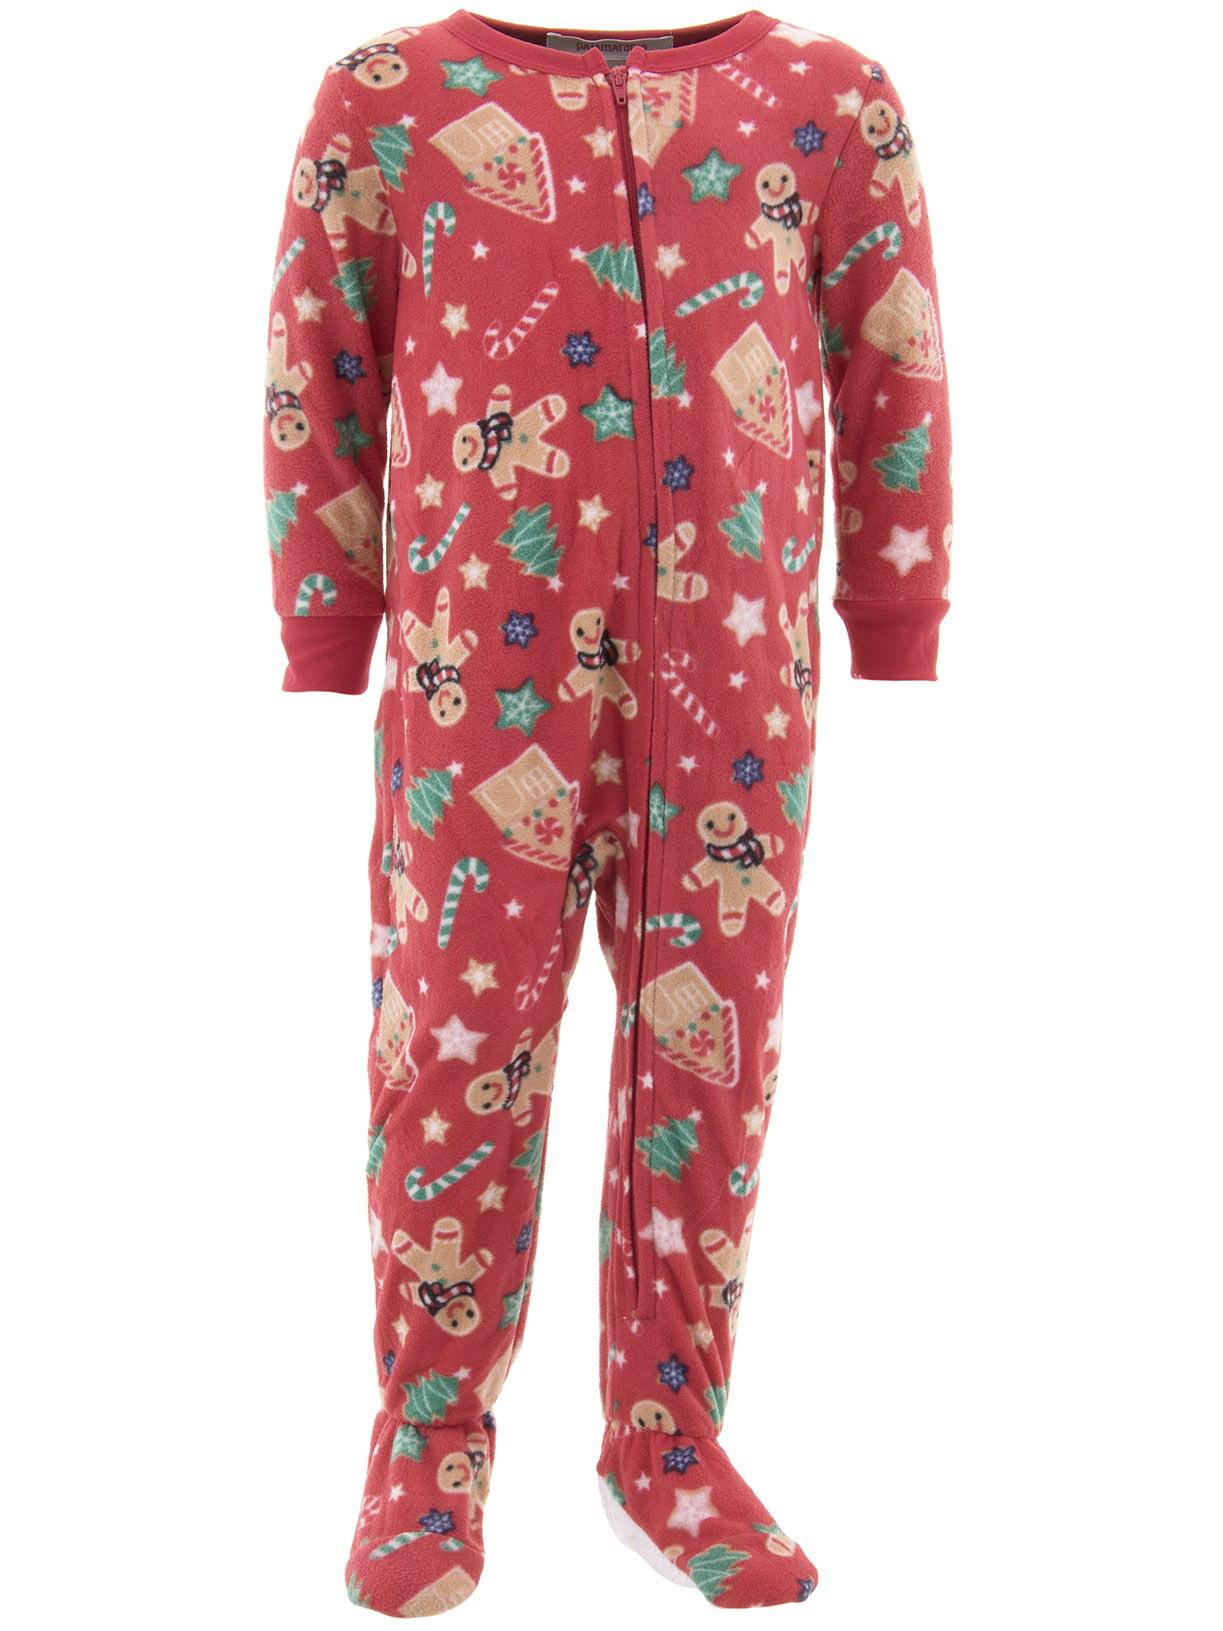 Gingerbread Men Toddler Christmas Blanket Sleeper Pajama